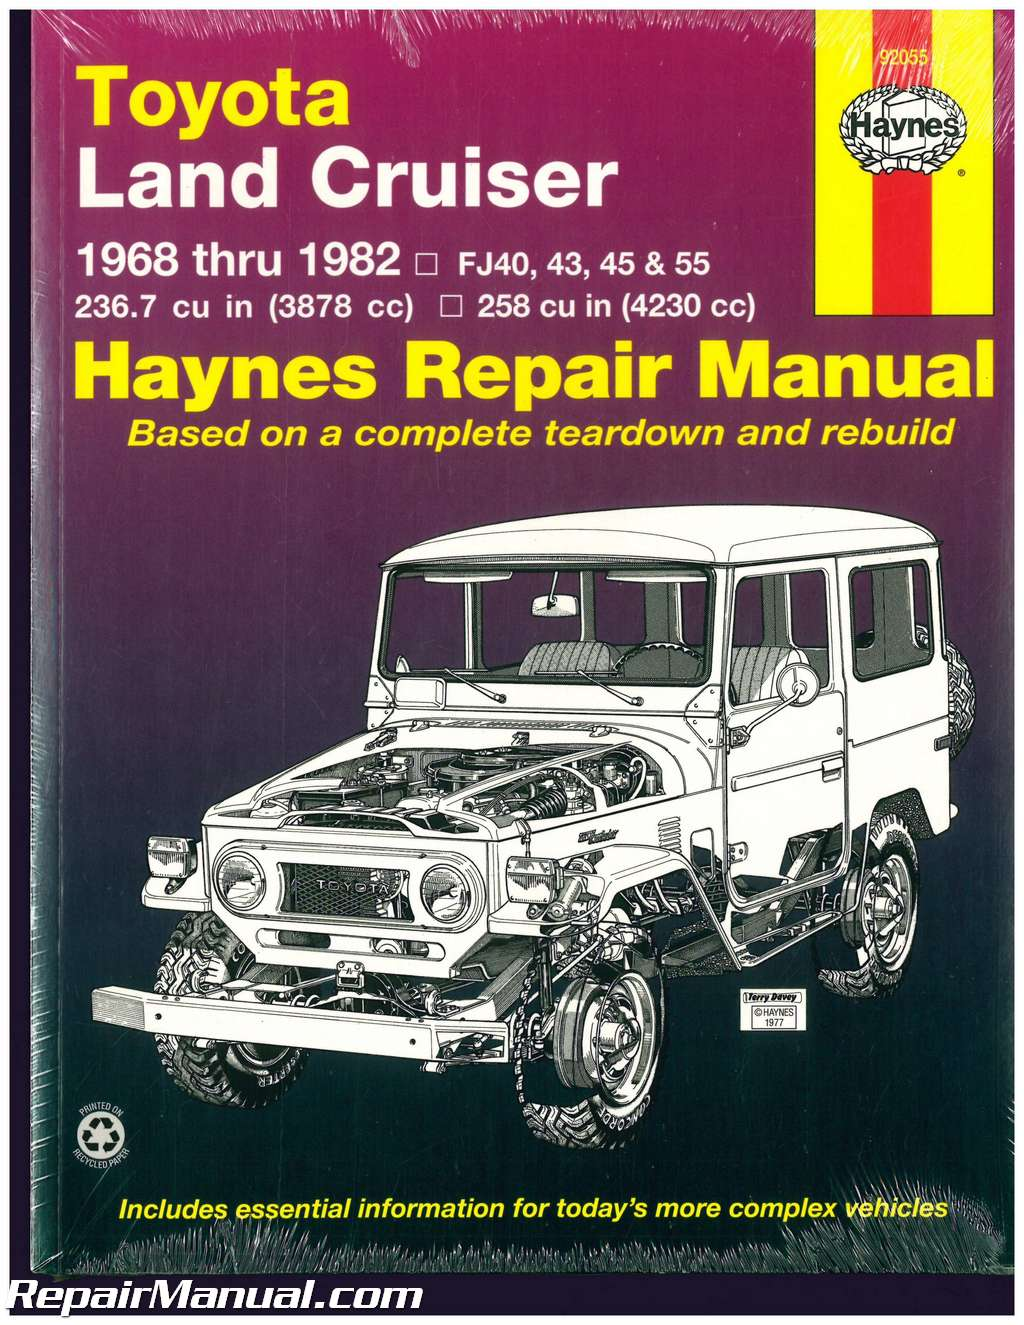 Haynes Toyota Land Cruiser 1968